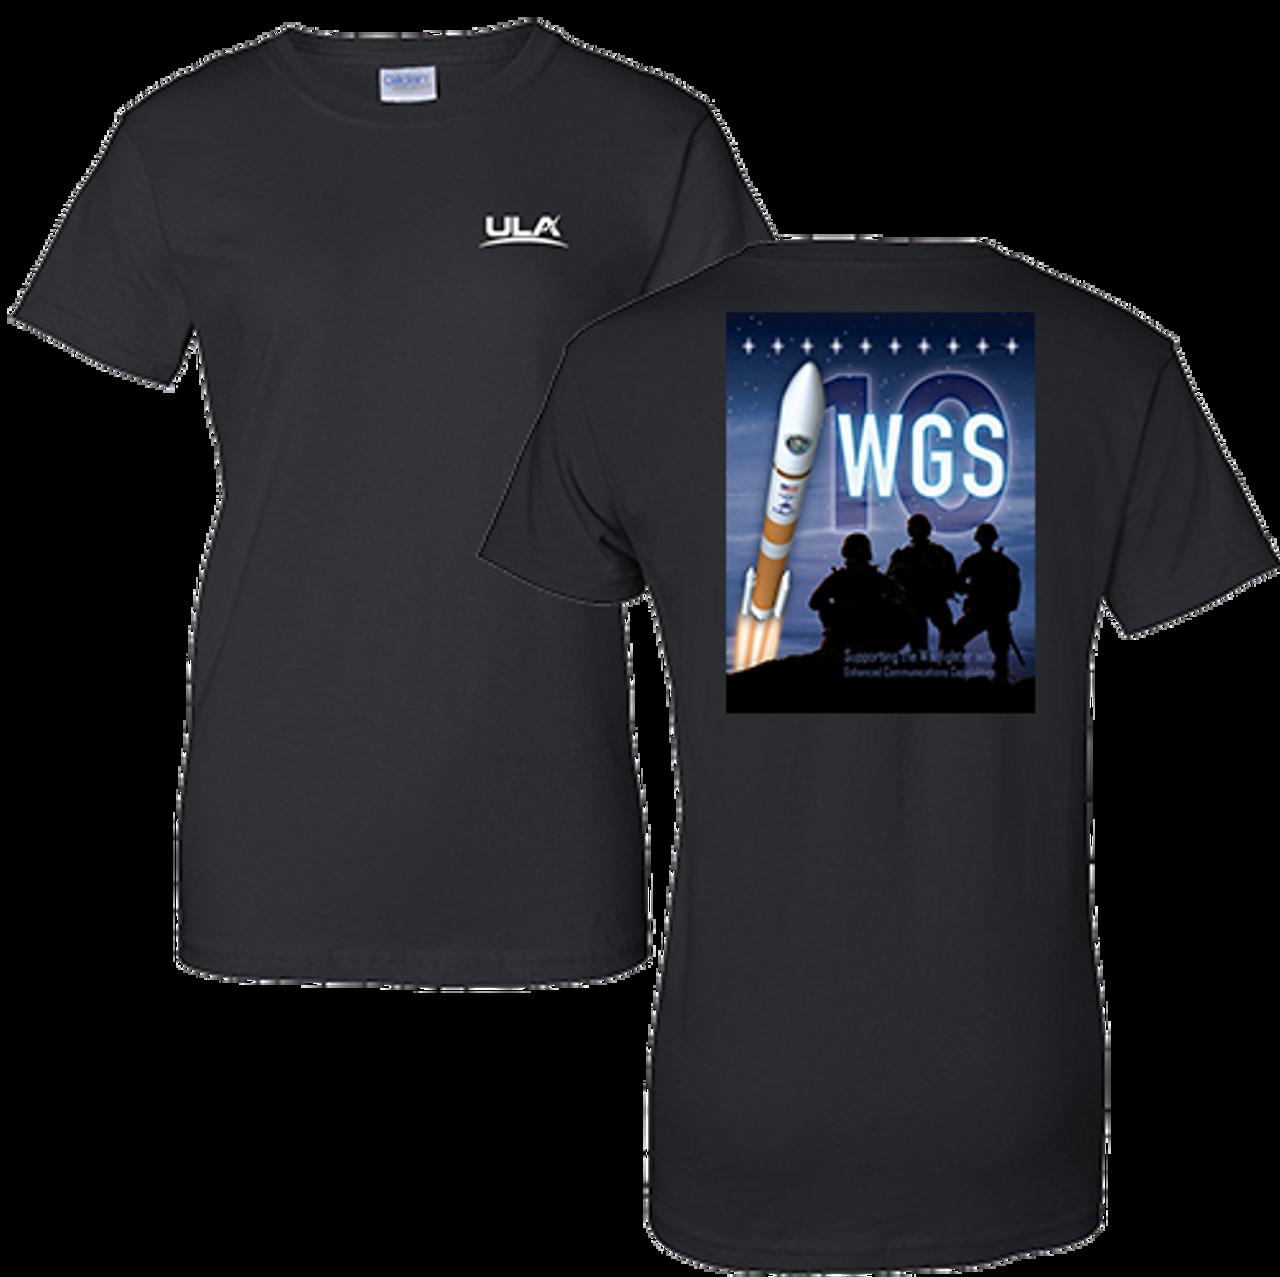 396fd260 WGS-10 Women's Short Sleeve T-Shirt - United Launch Alliance